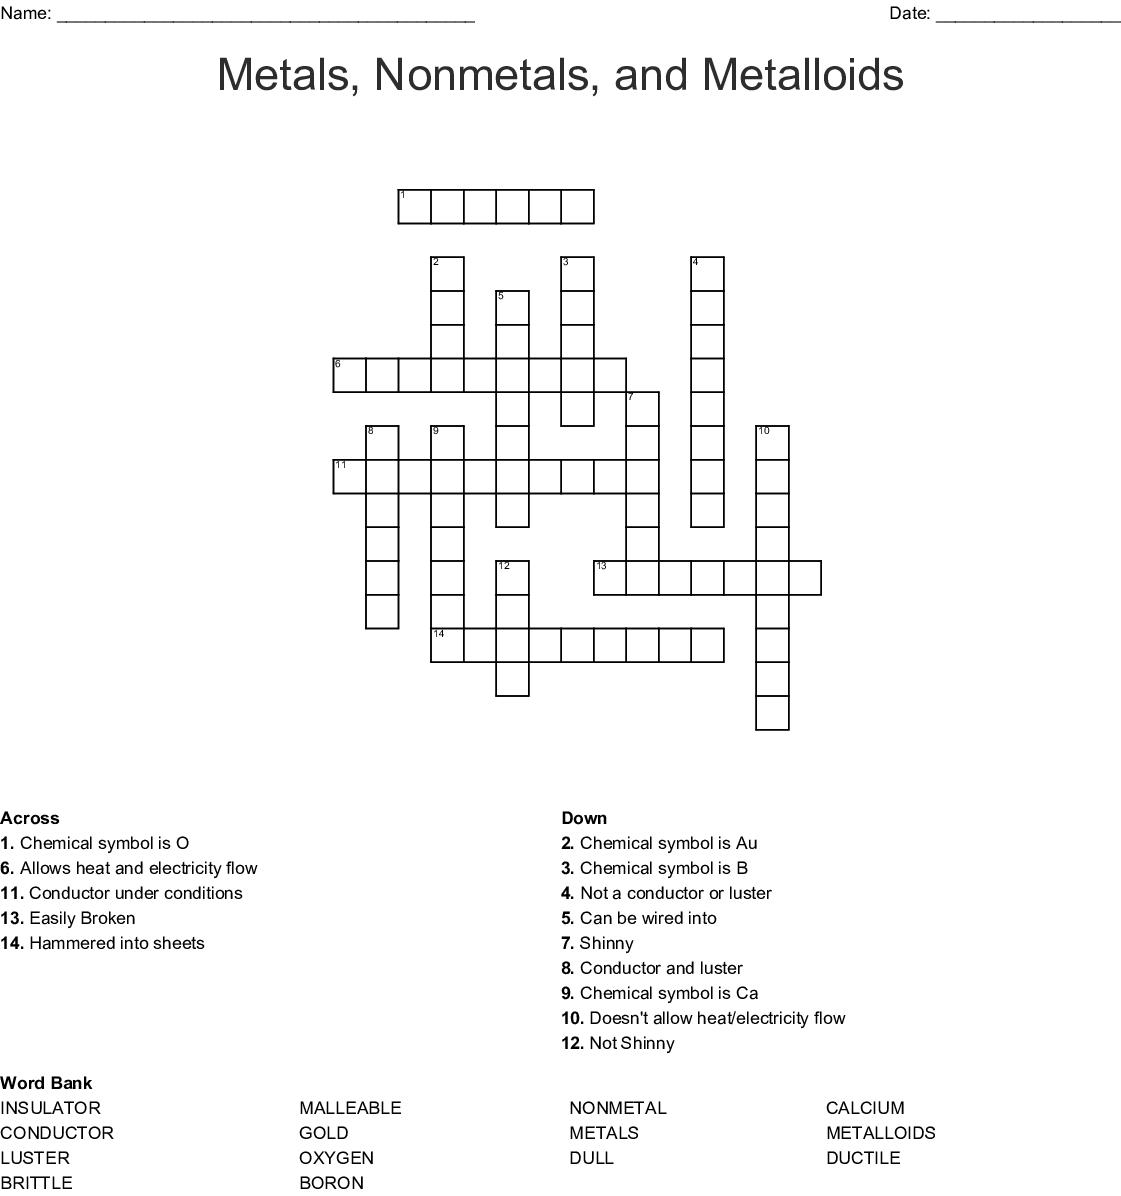 Metals Nonmetals And Metalloids Crossword